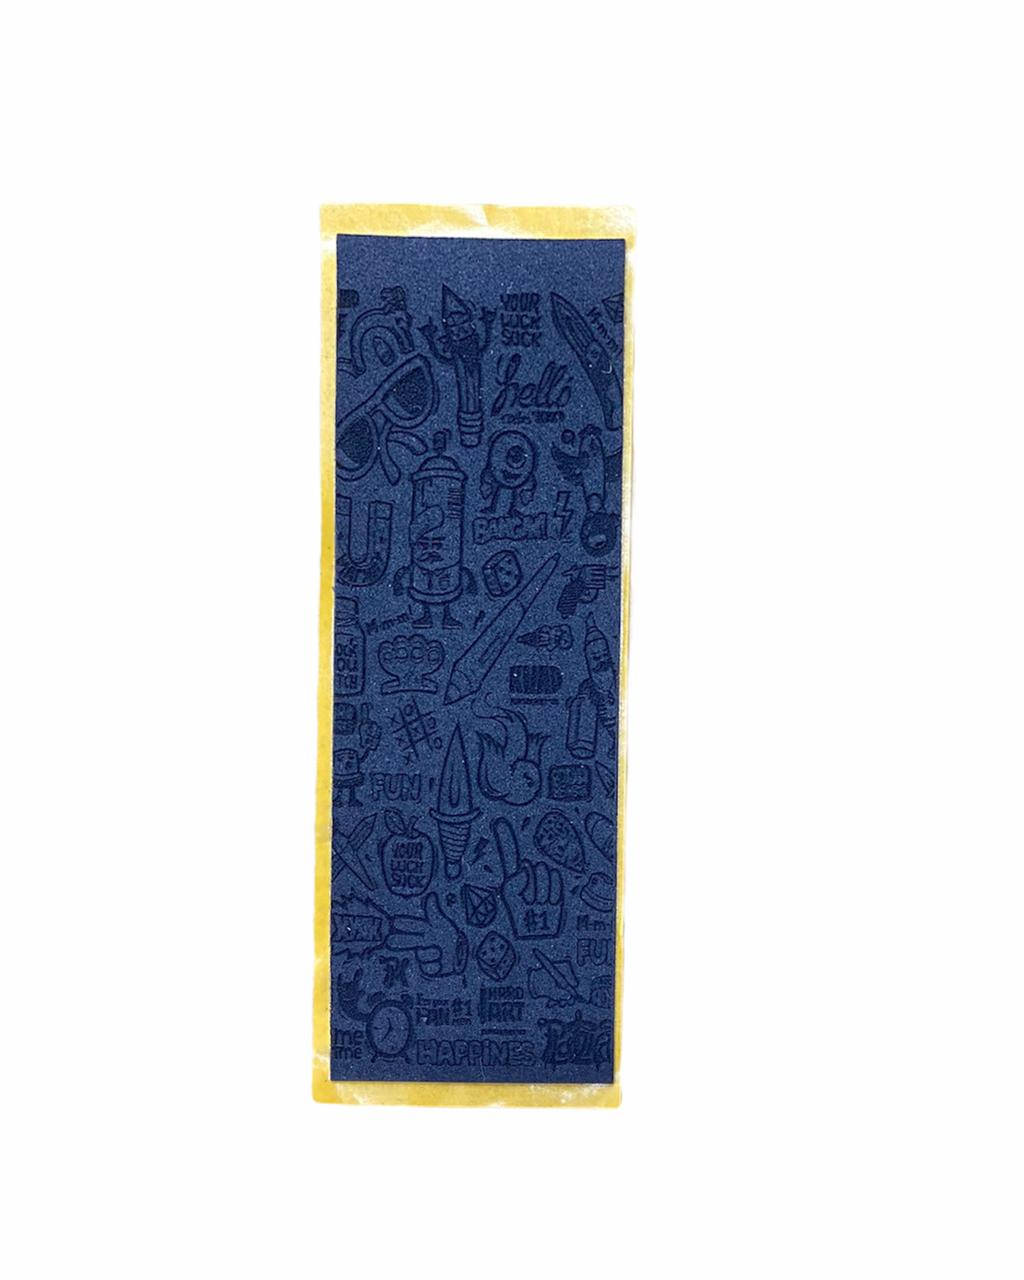 Tape Uncut Fingerboard AVULSA (01 unidade) PRO Engraved Collage - (FRETE CARTA INCLUIDO)